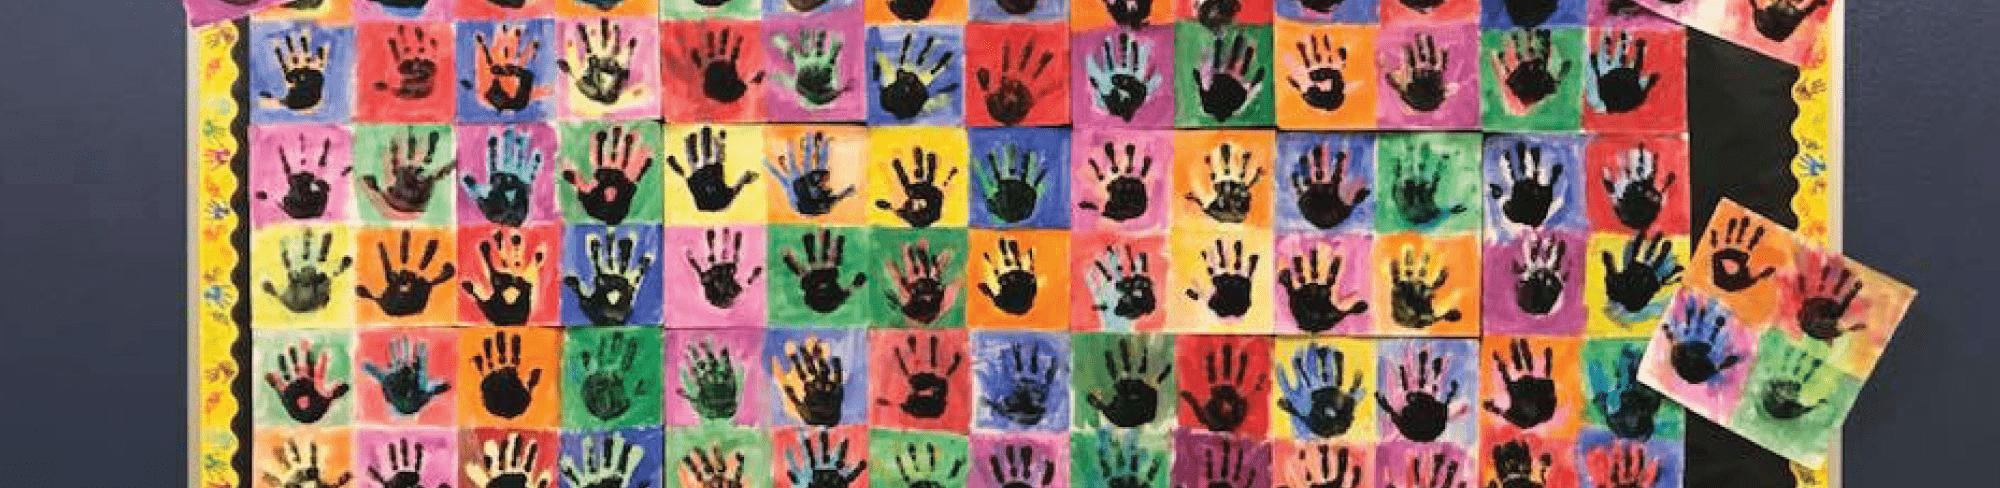 Handprint artwork